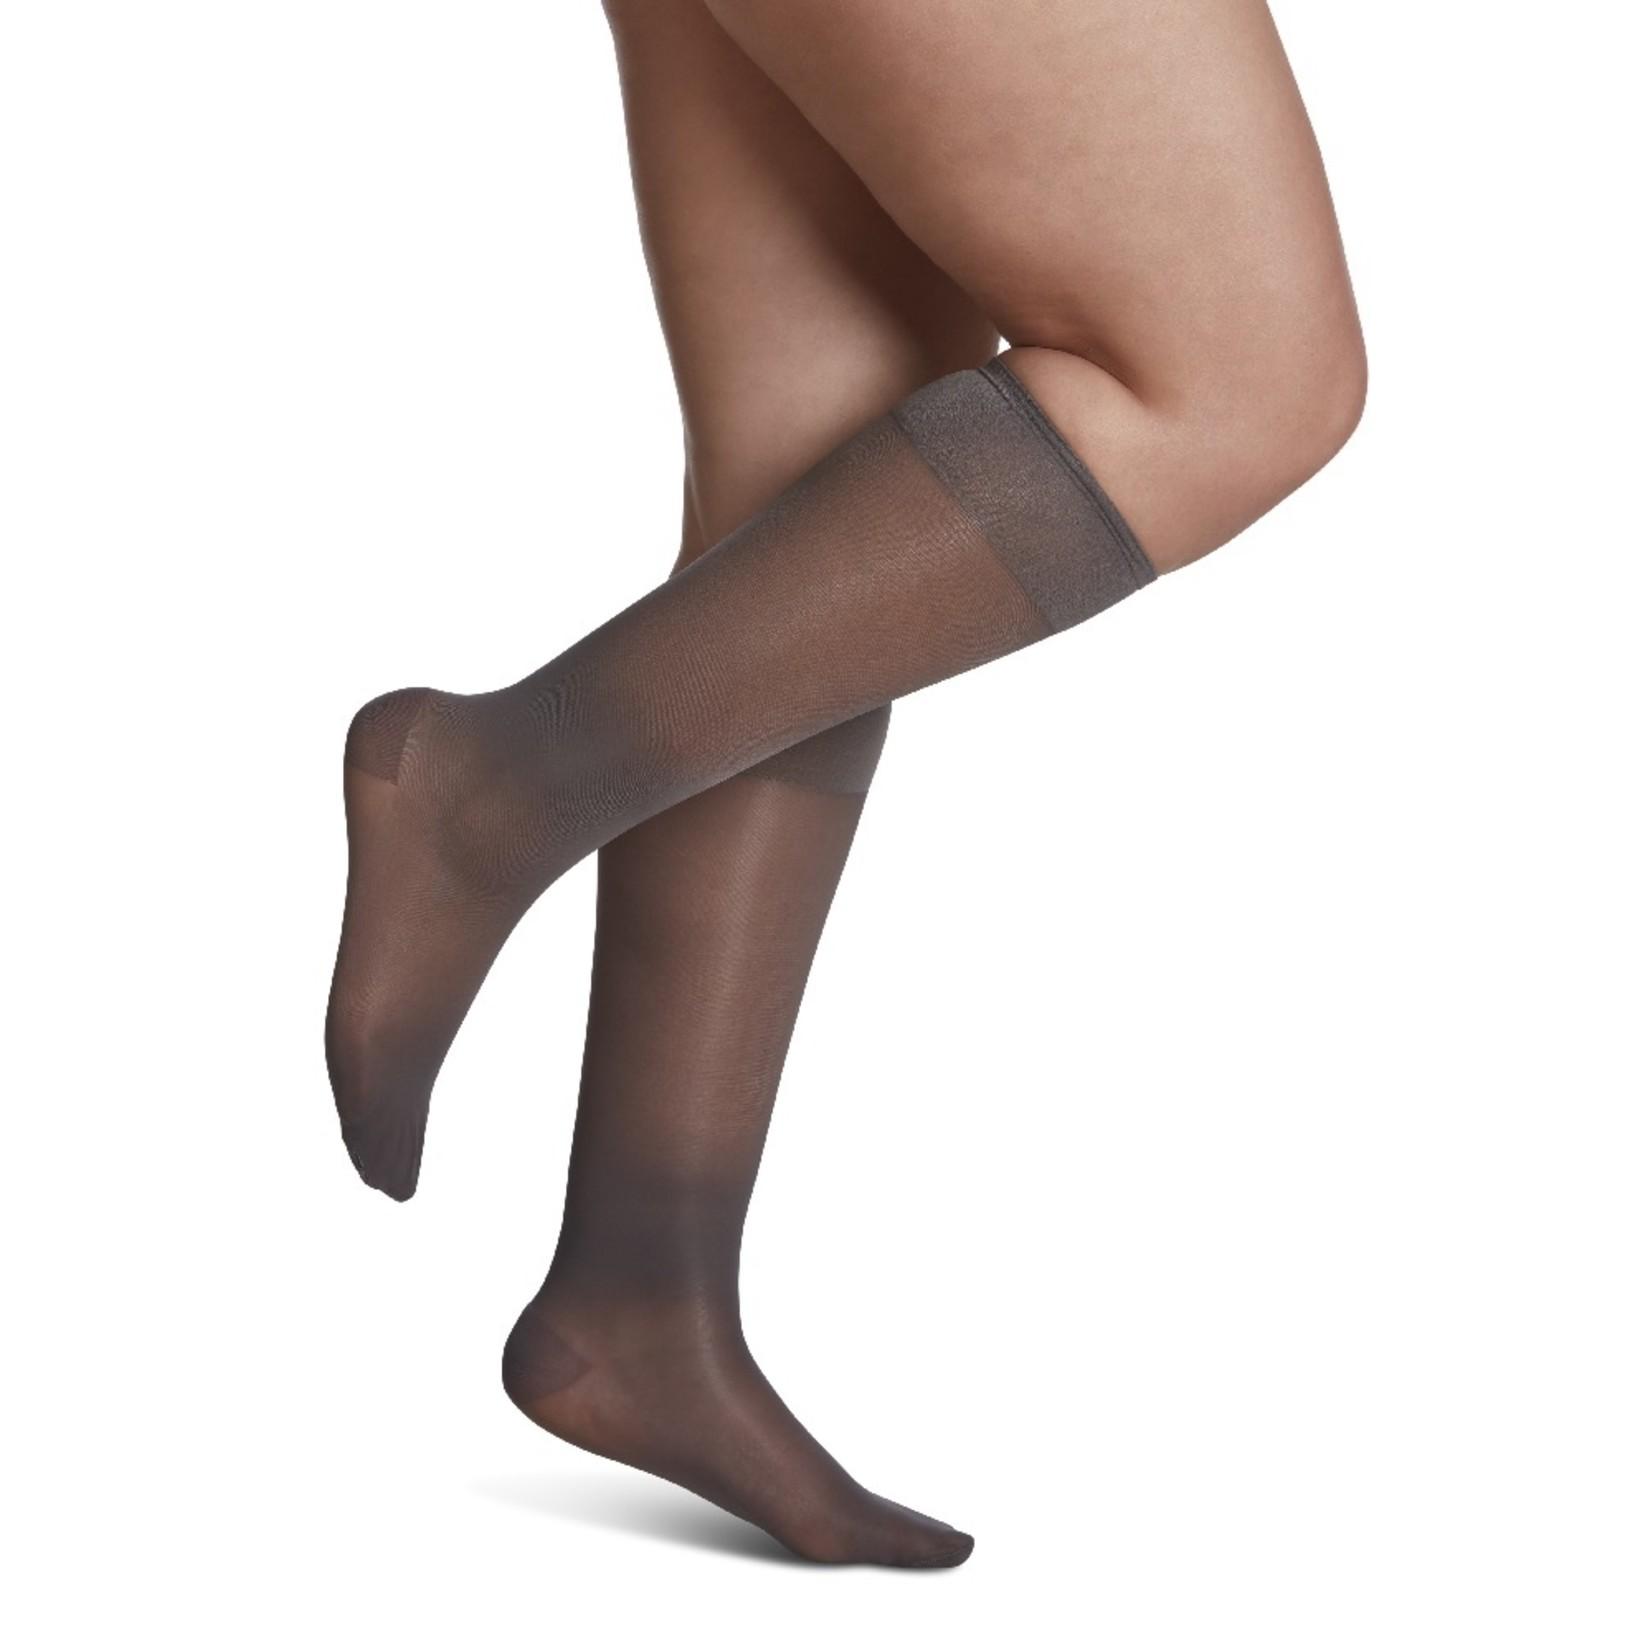 SIGVARIS Women's Sheer Fashion Calf 15-20mmHg